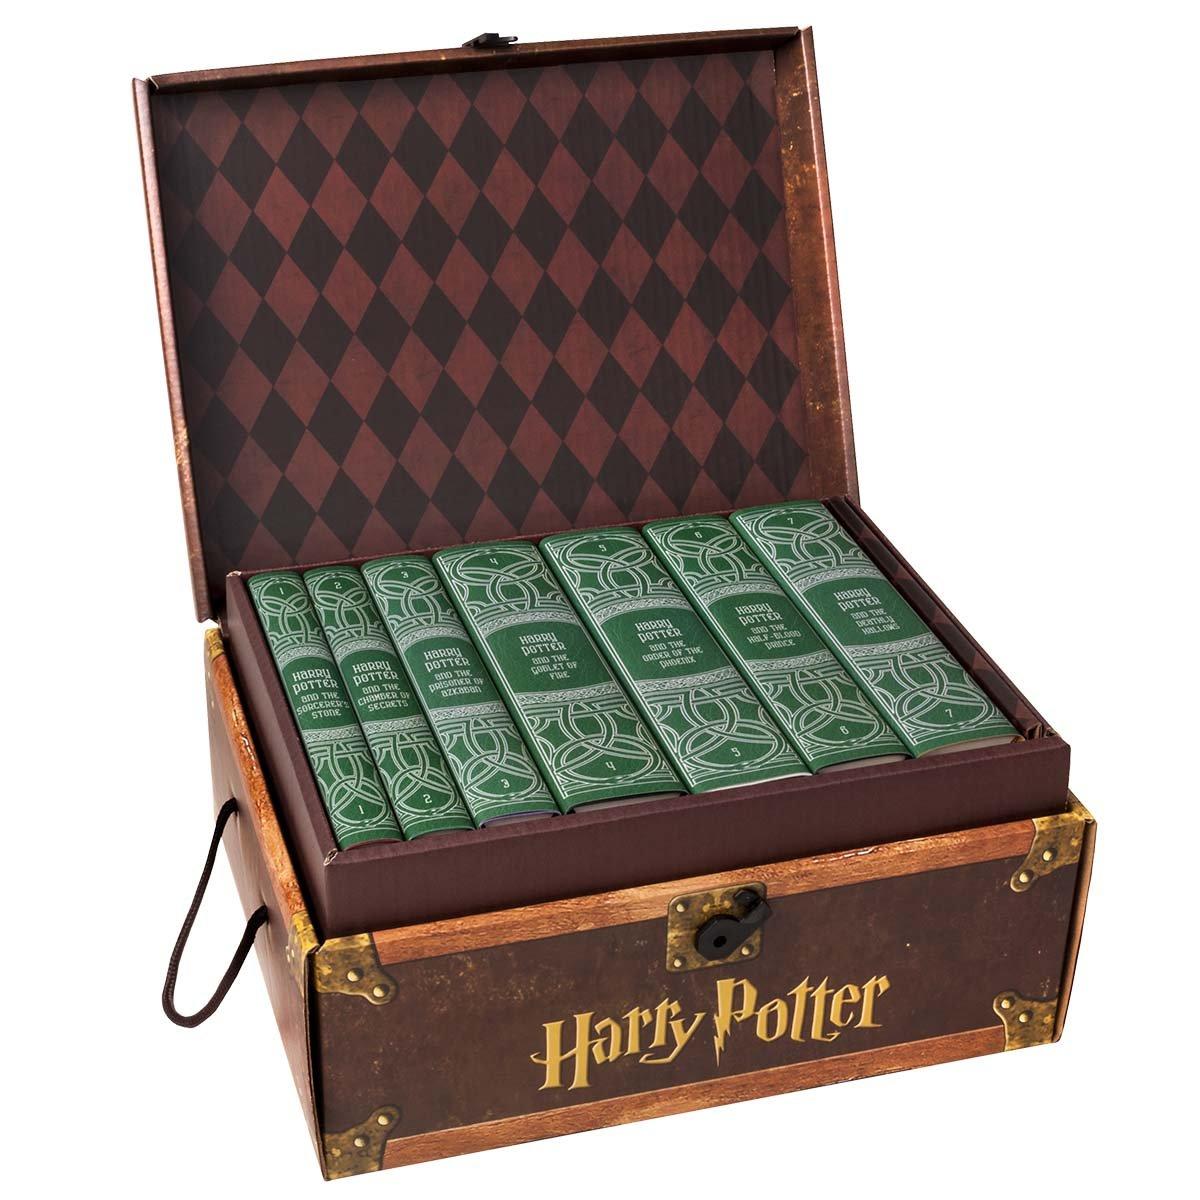 Harry Potter House Trunk Sets (Slytherin Set) by Juniper Books